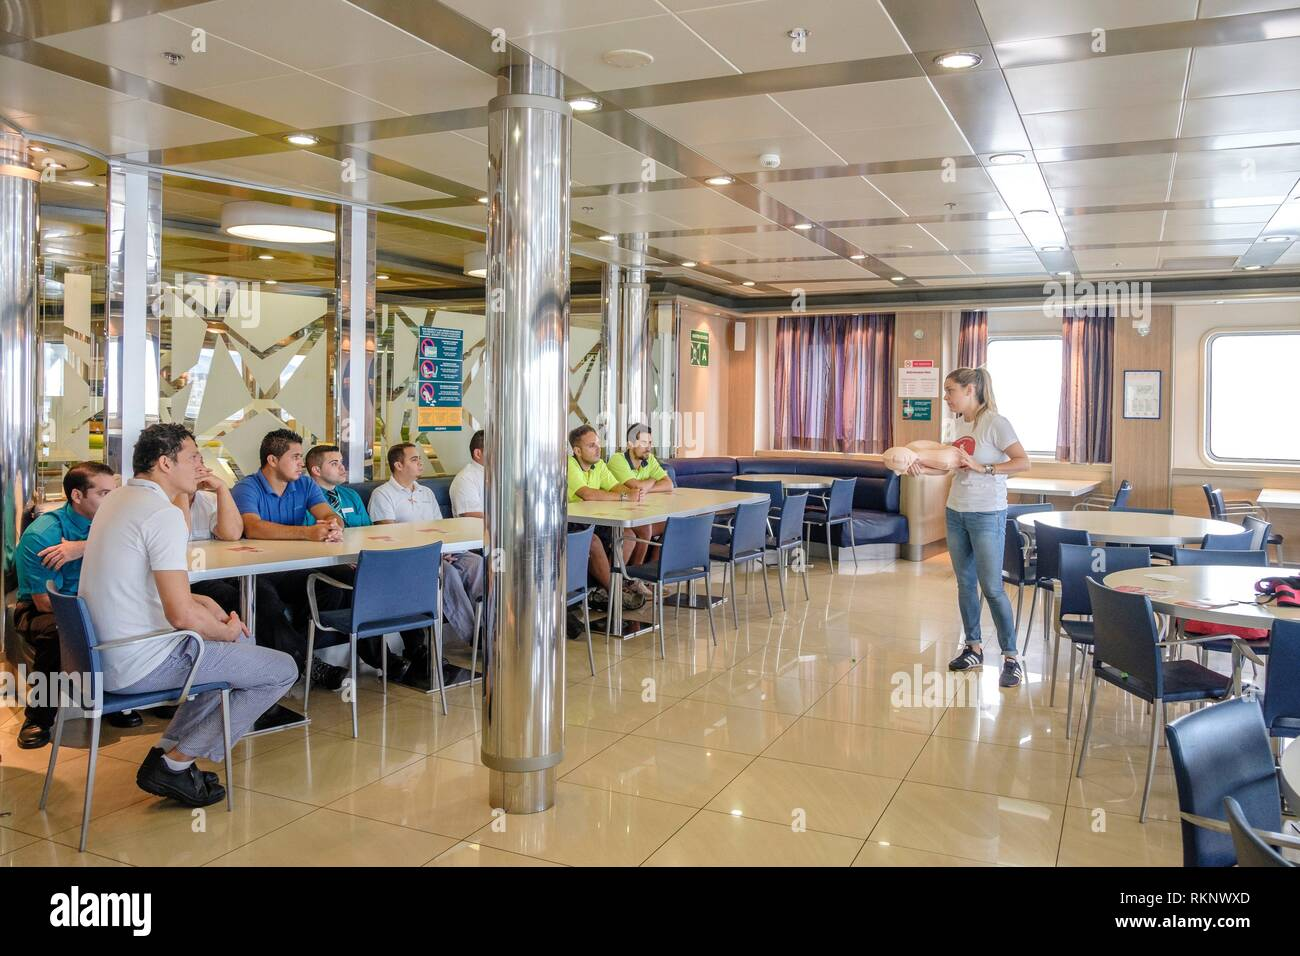 First aid training course, Visemar-Balearia ship, port of Palma, Mallorca, Balearic islands, Spain. - Stock Image